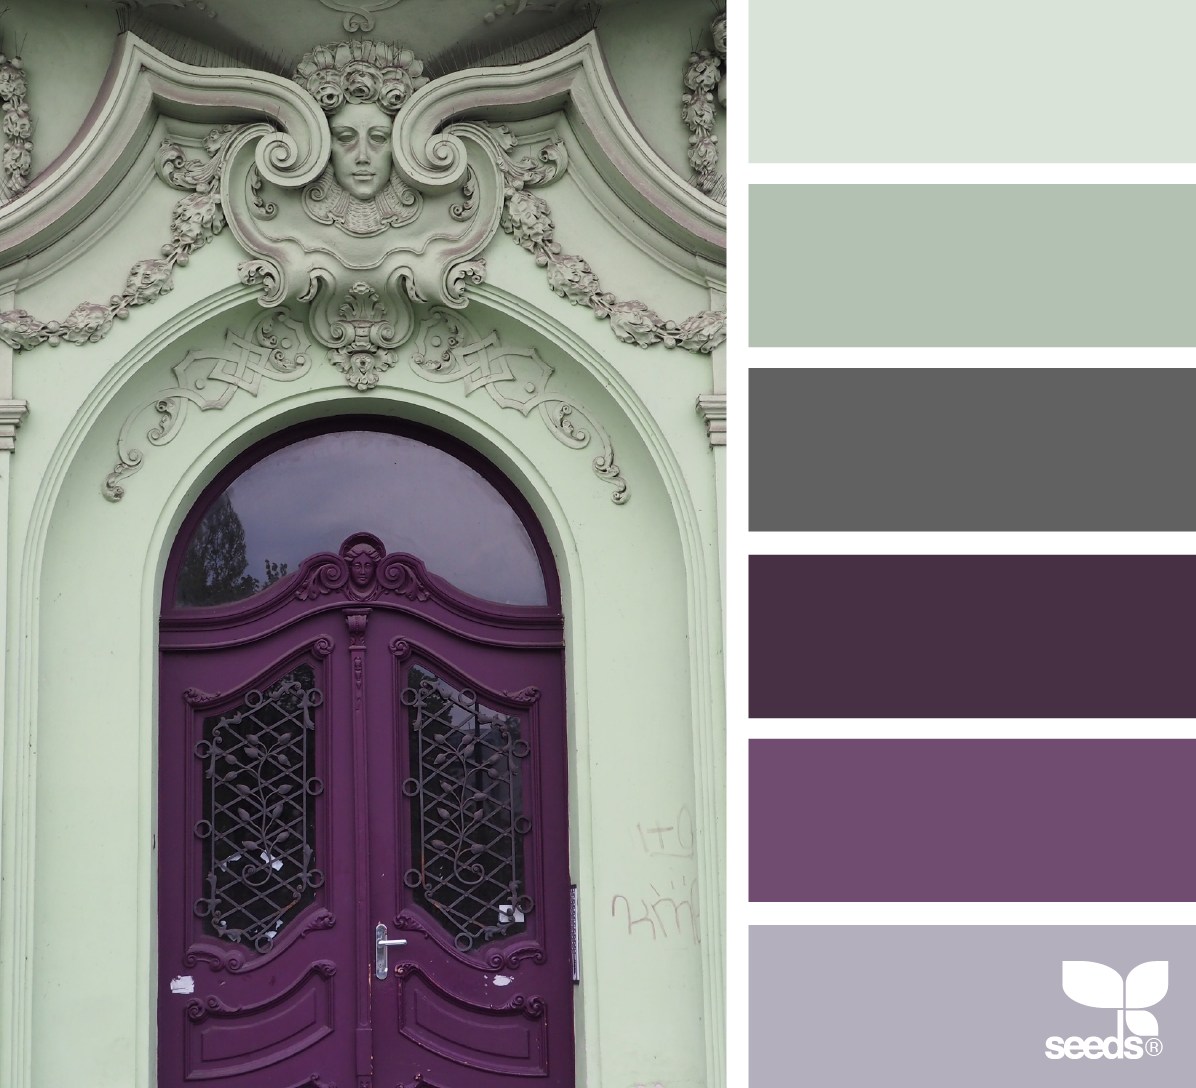 Transitional Paint Color Palette Color Palette Monday 3: Dreamn4ever Designs: September Pick-A-Palette Tally